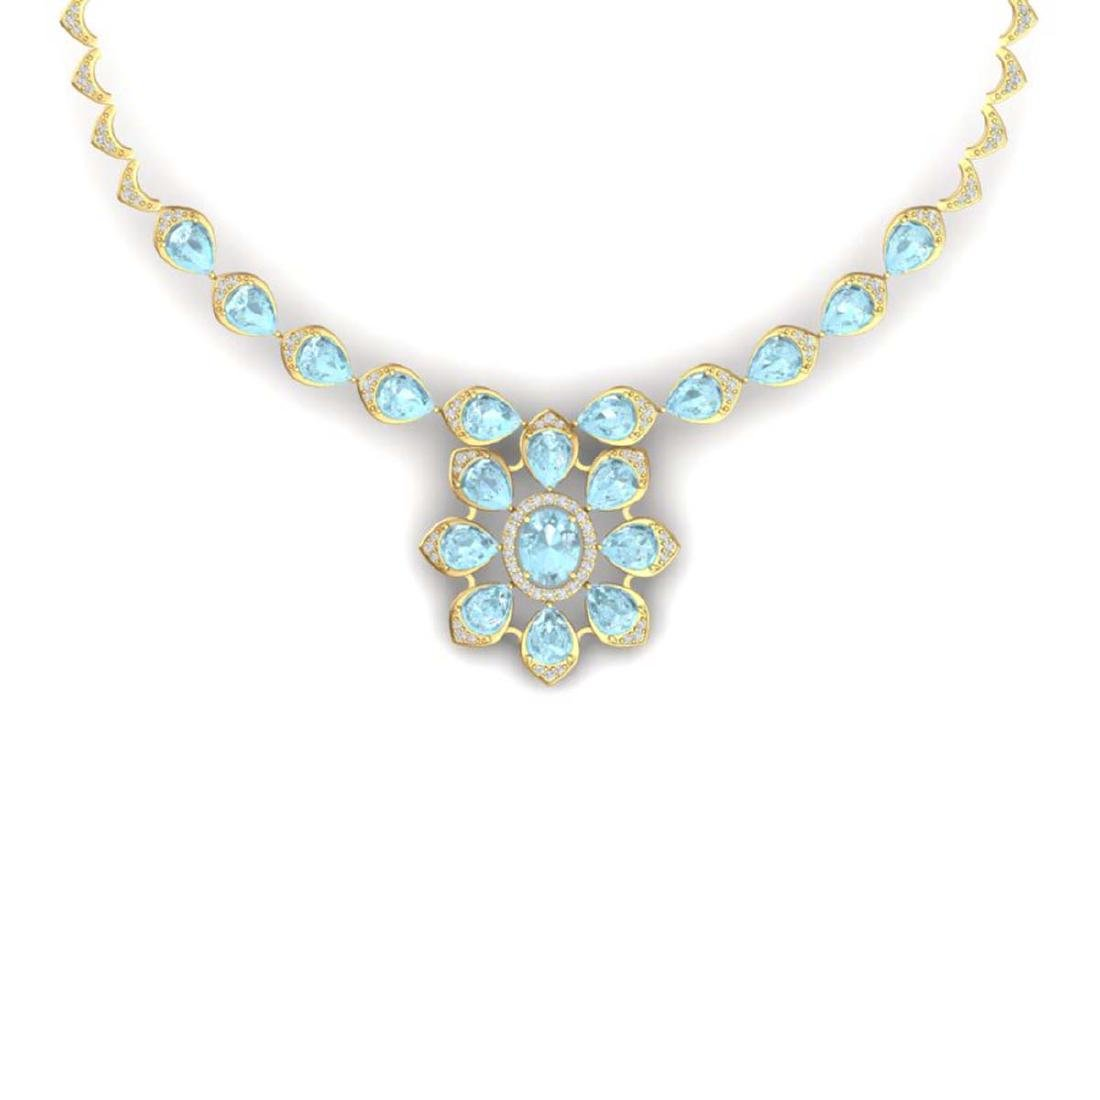 29.34 ctw Sky Topaz & VS Diamond Necklace 18K Yellow